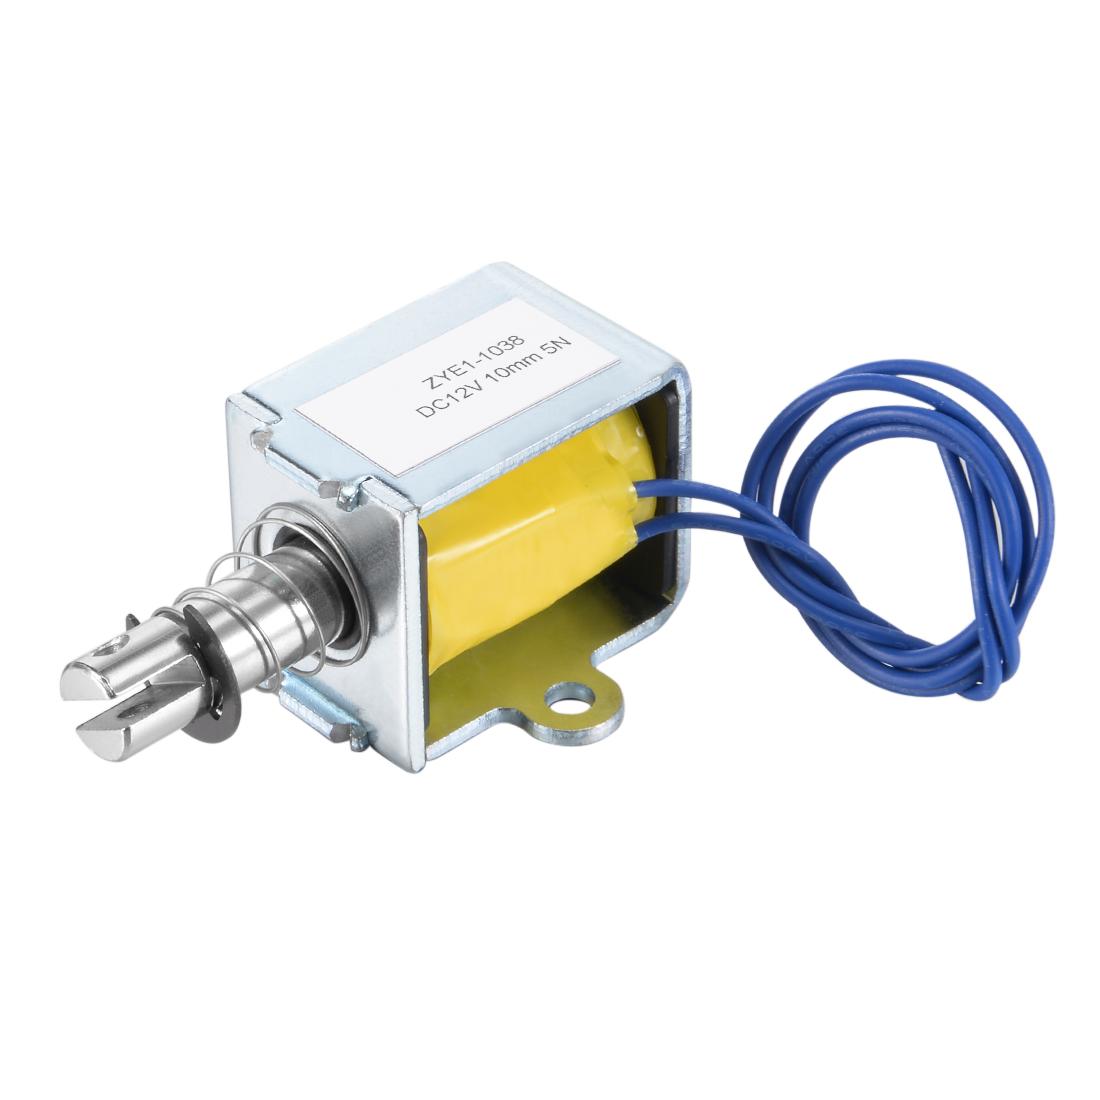 ZYE1(TAU)-1038 DC 12V,Pull Type Open Frame Solenoid Electromagnet